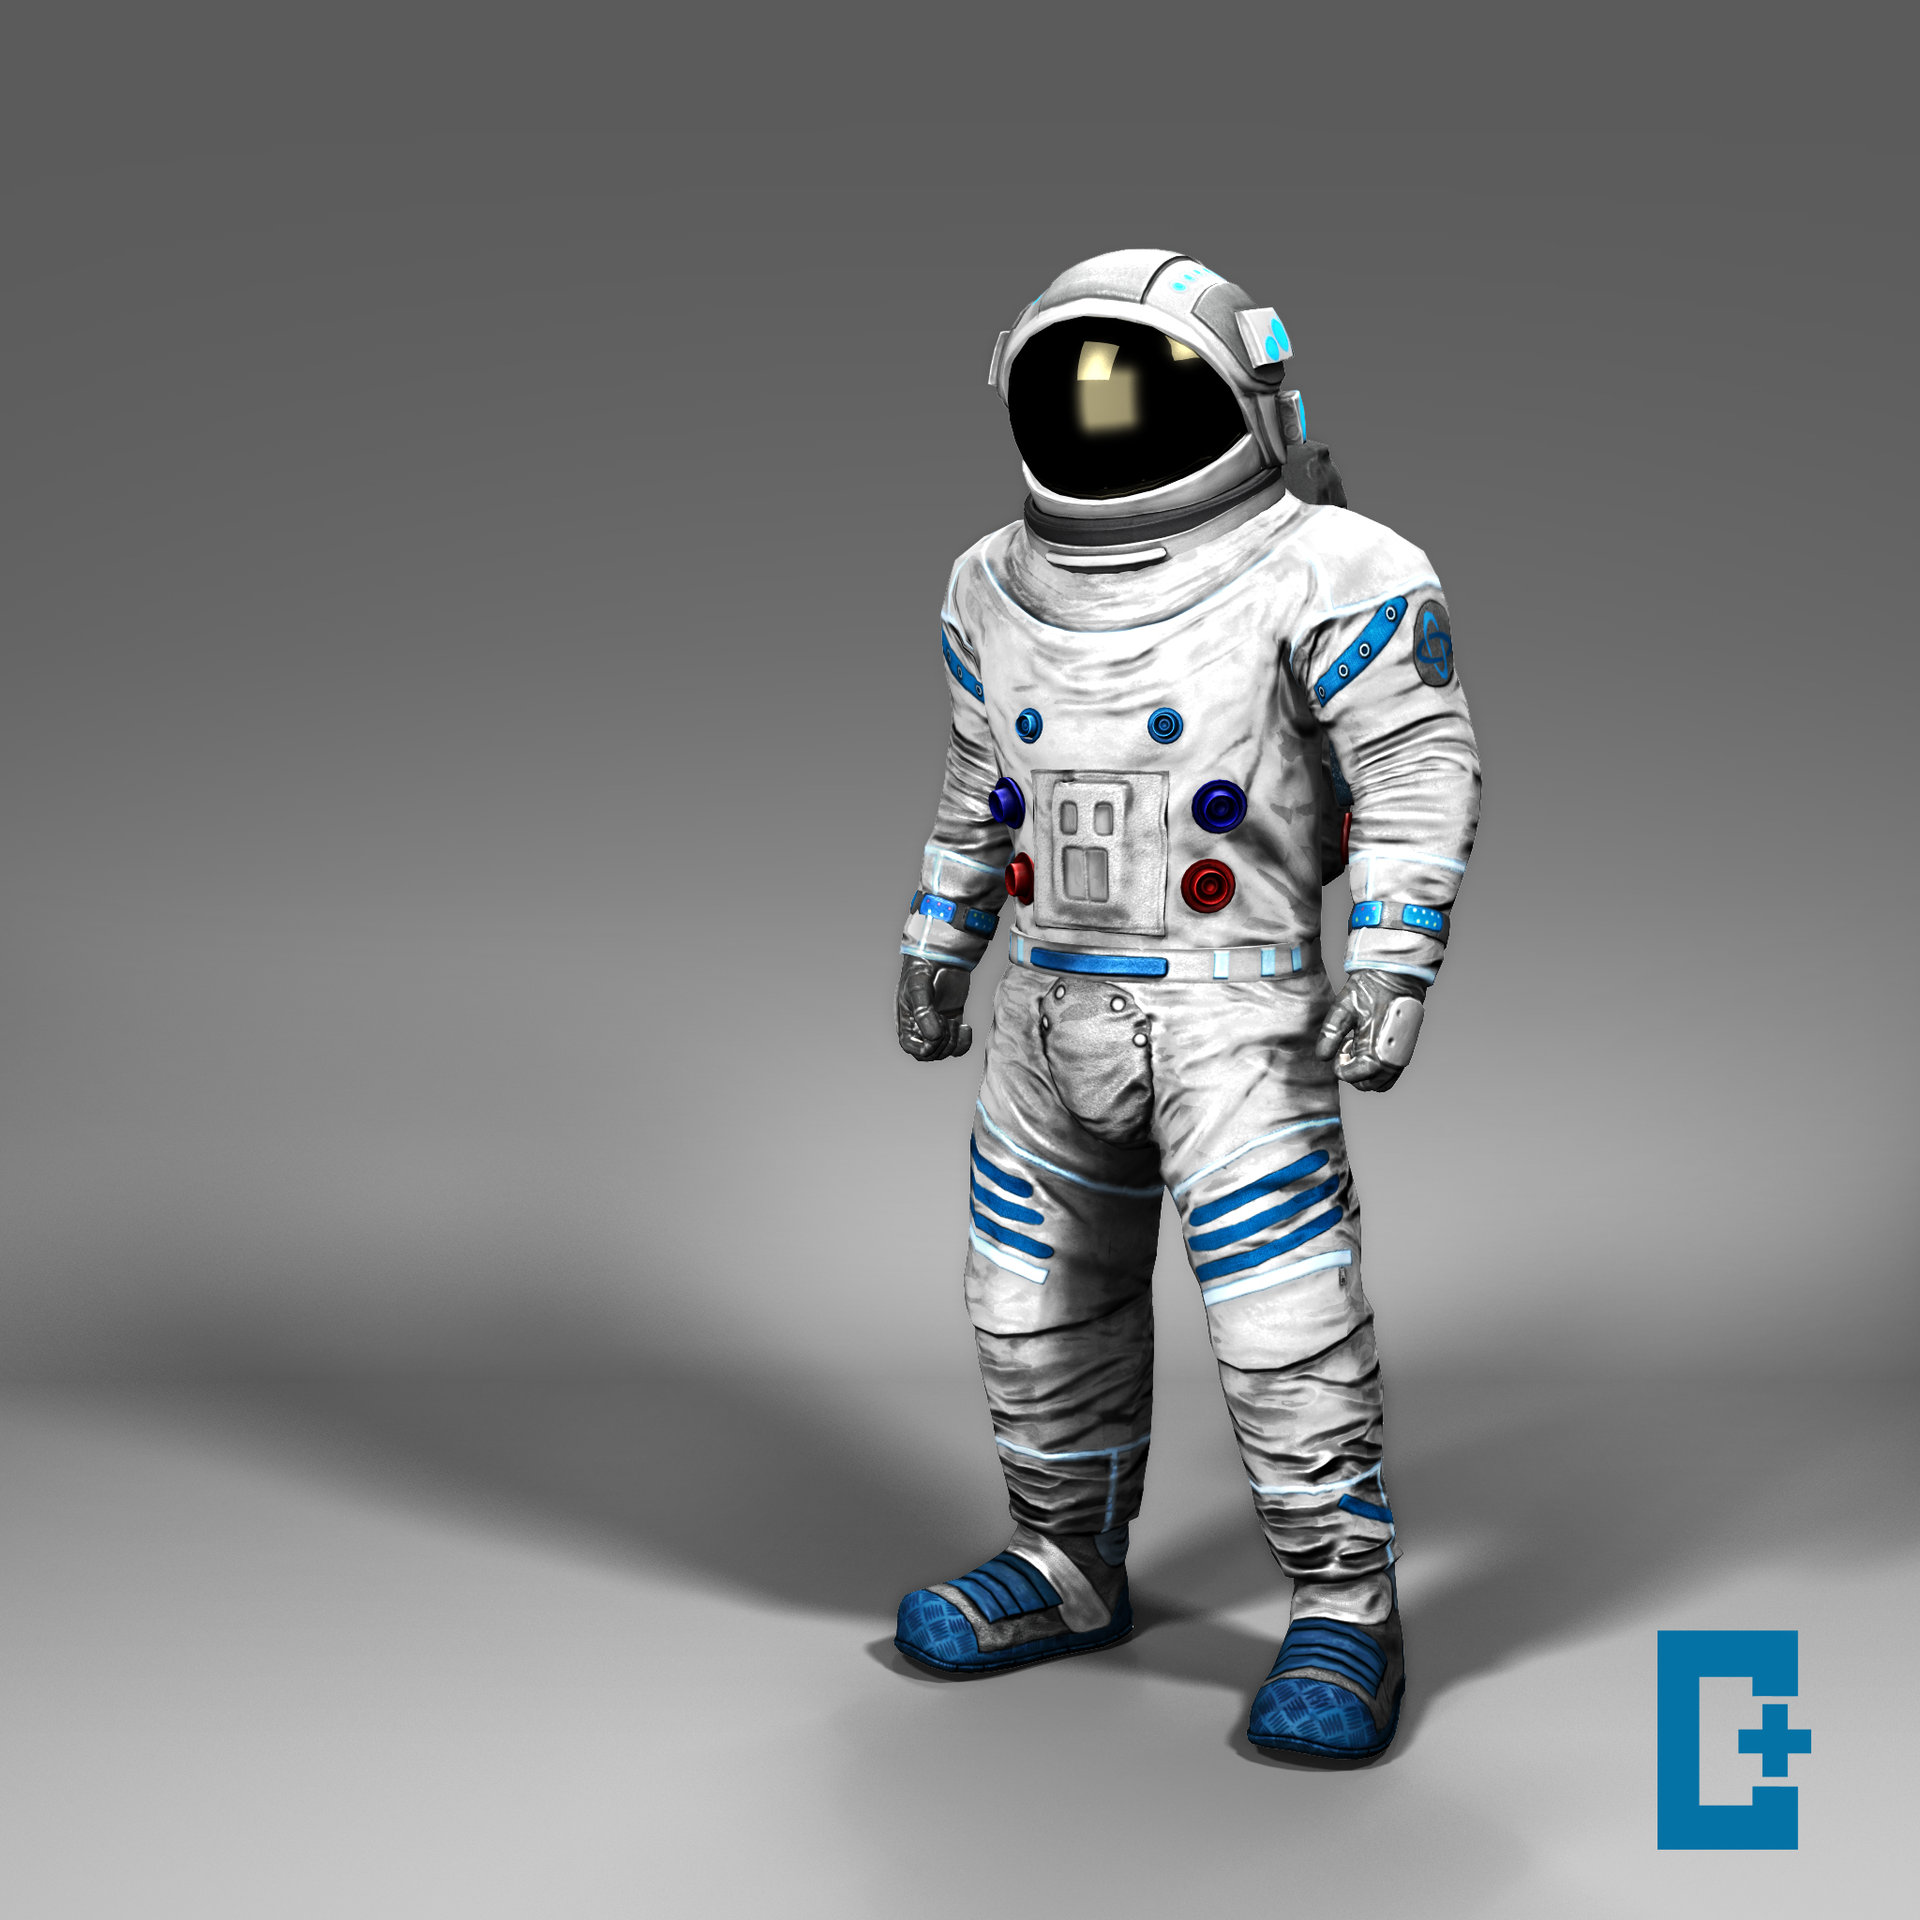 astronaut in suit - HD1920×1920